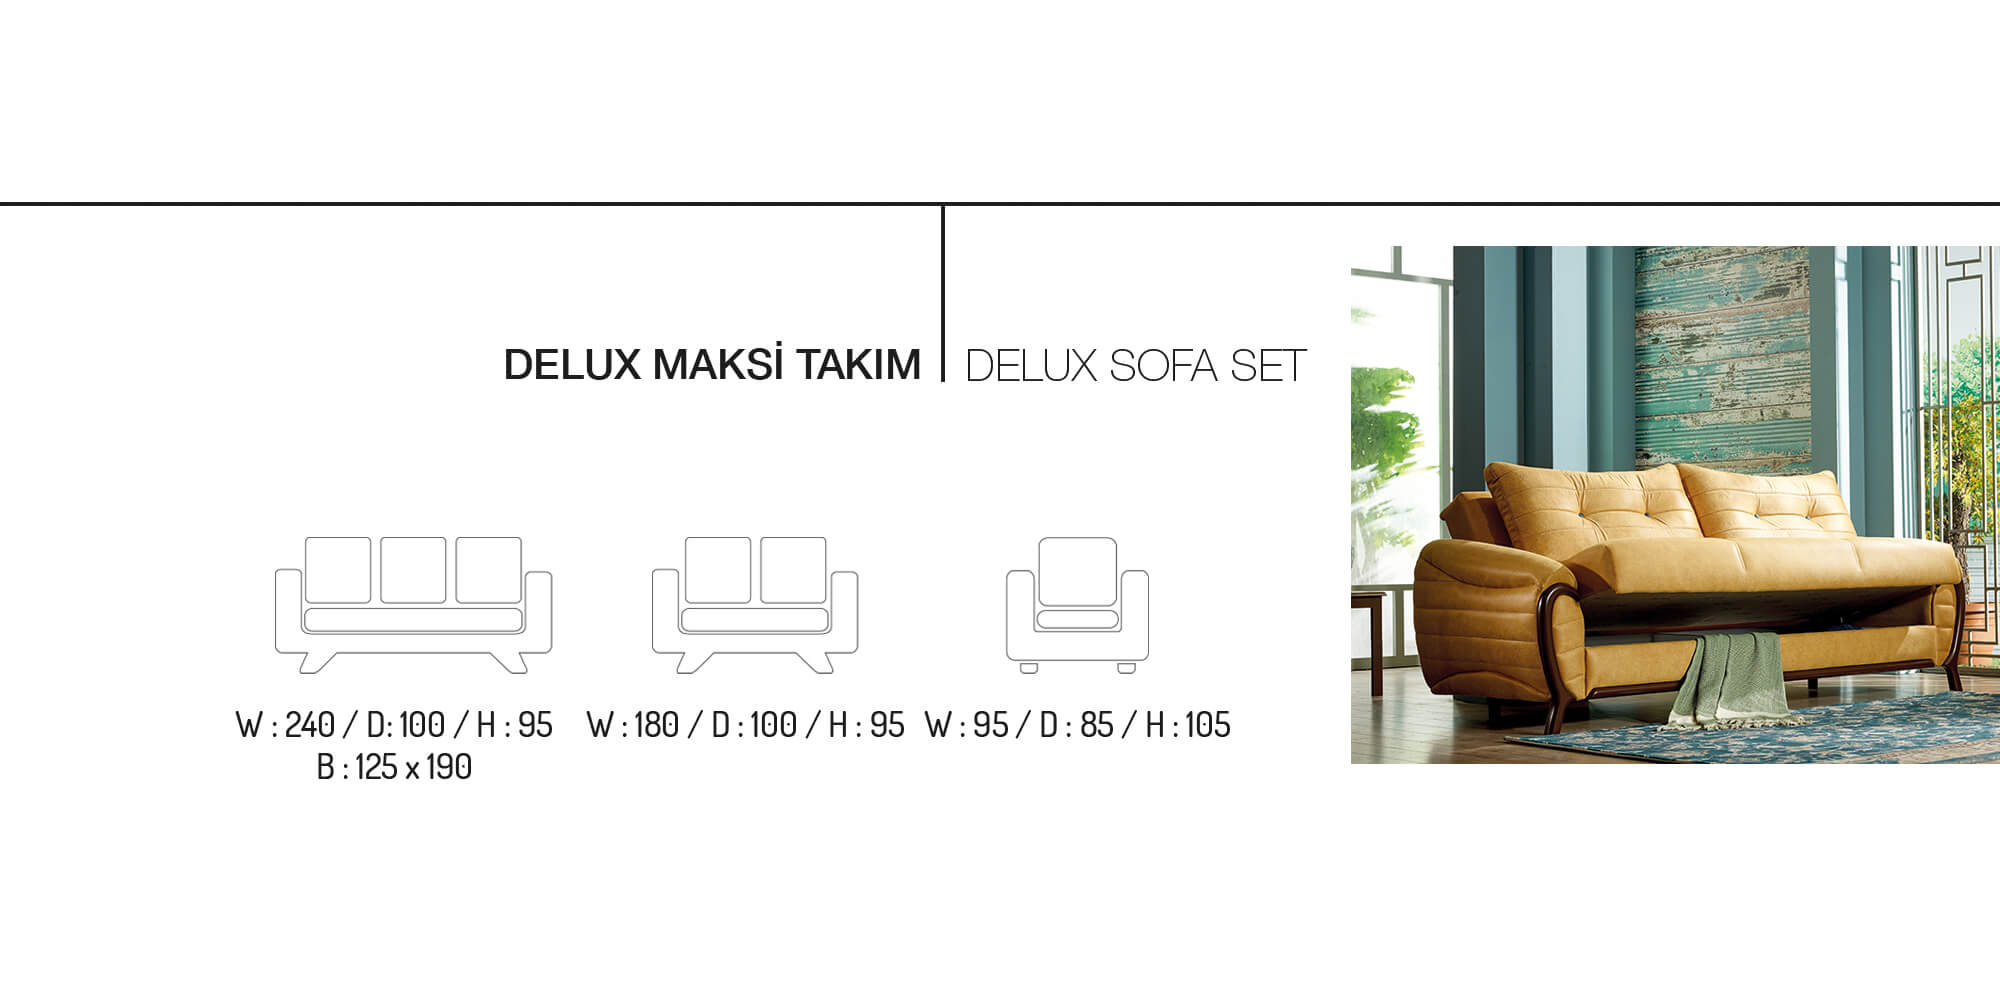 bobo-deluxe-sofa-set-4